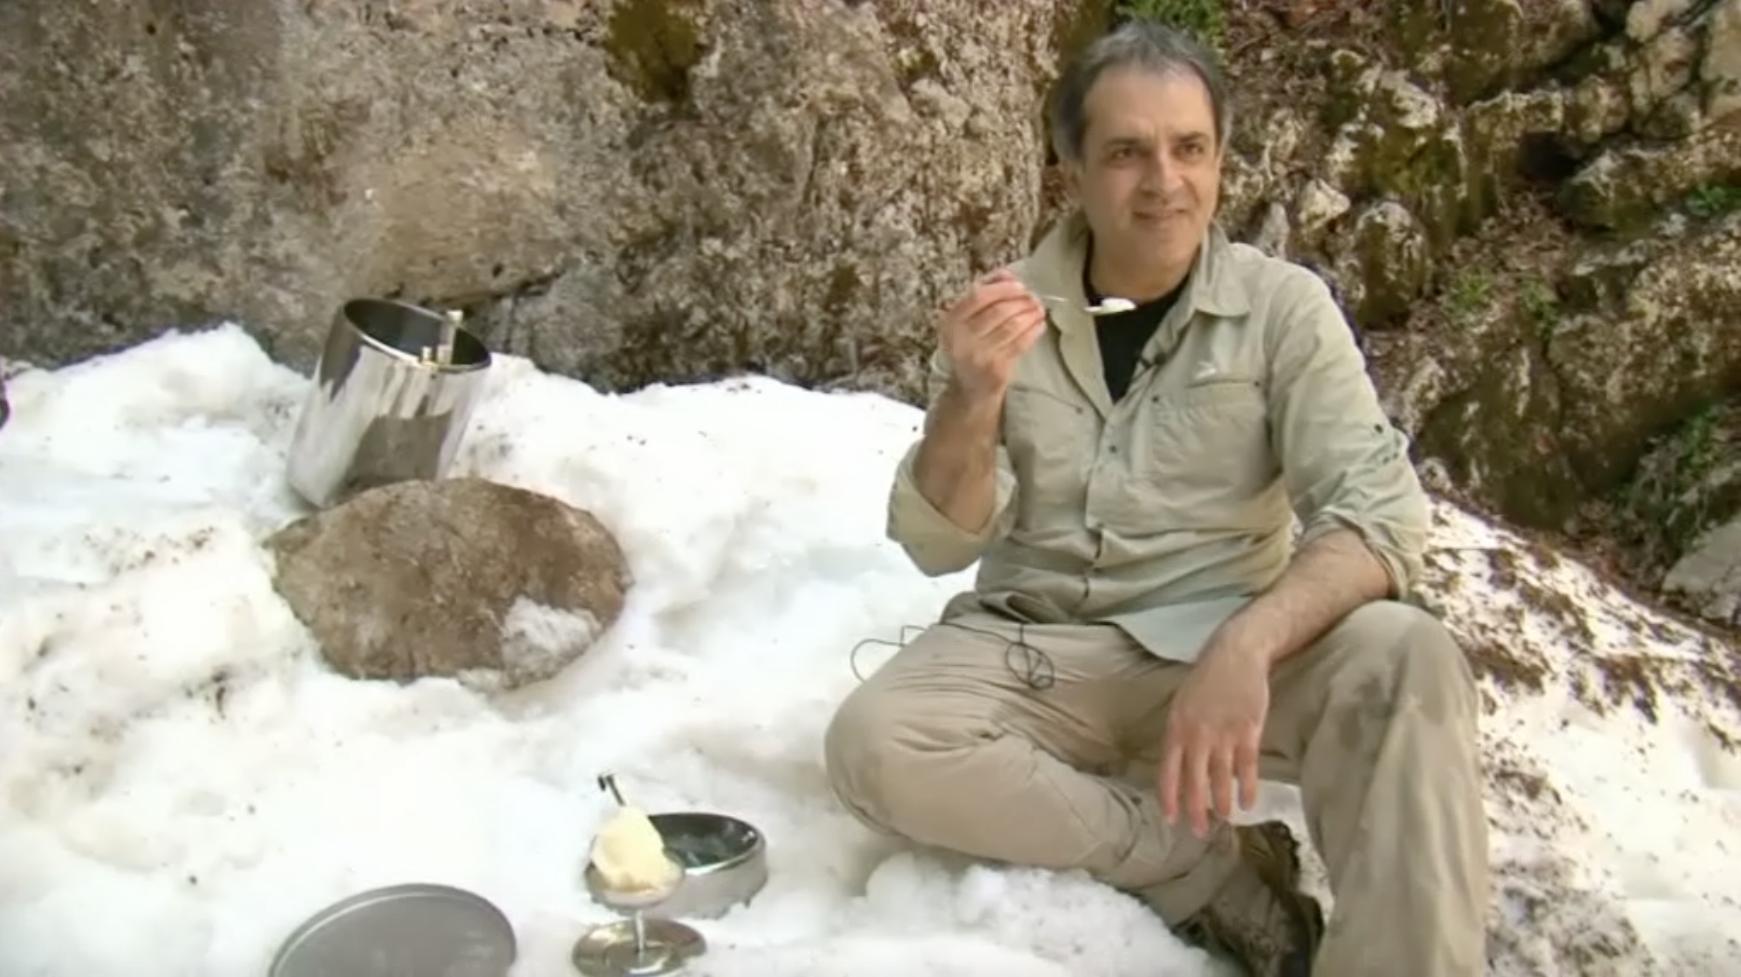 antonio capapdonia granita siciliana